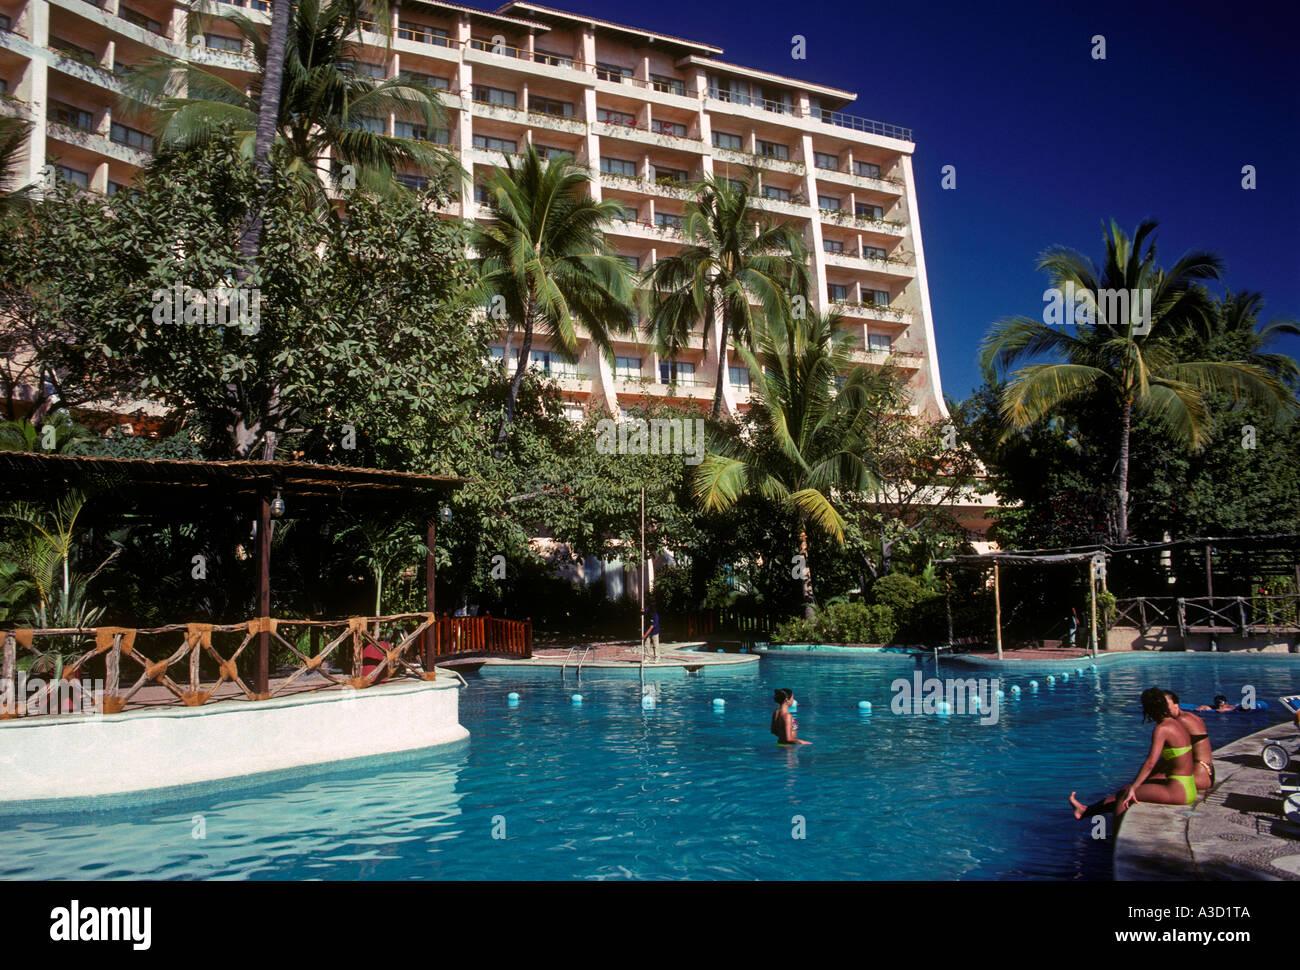 Xalixco stock photos xalixco stock images alamy for What is a freshwater swimming pool